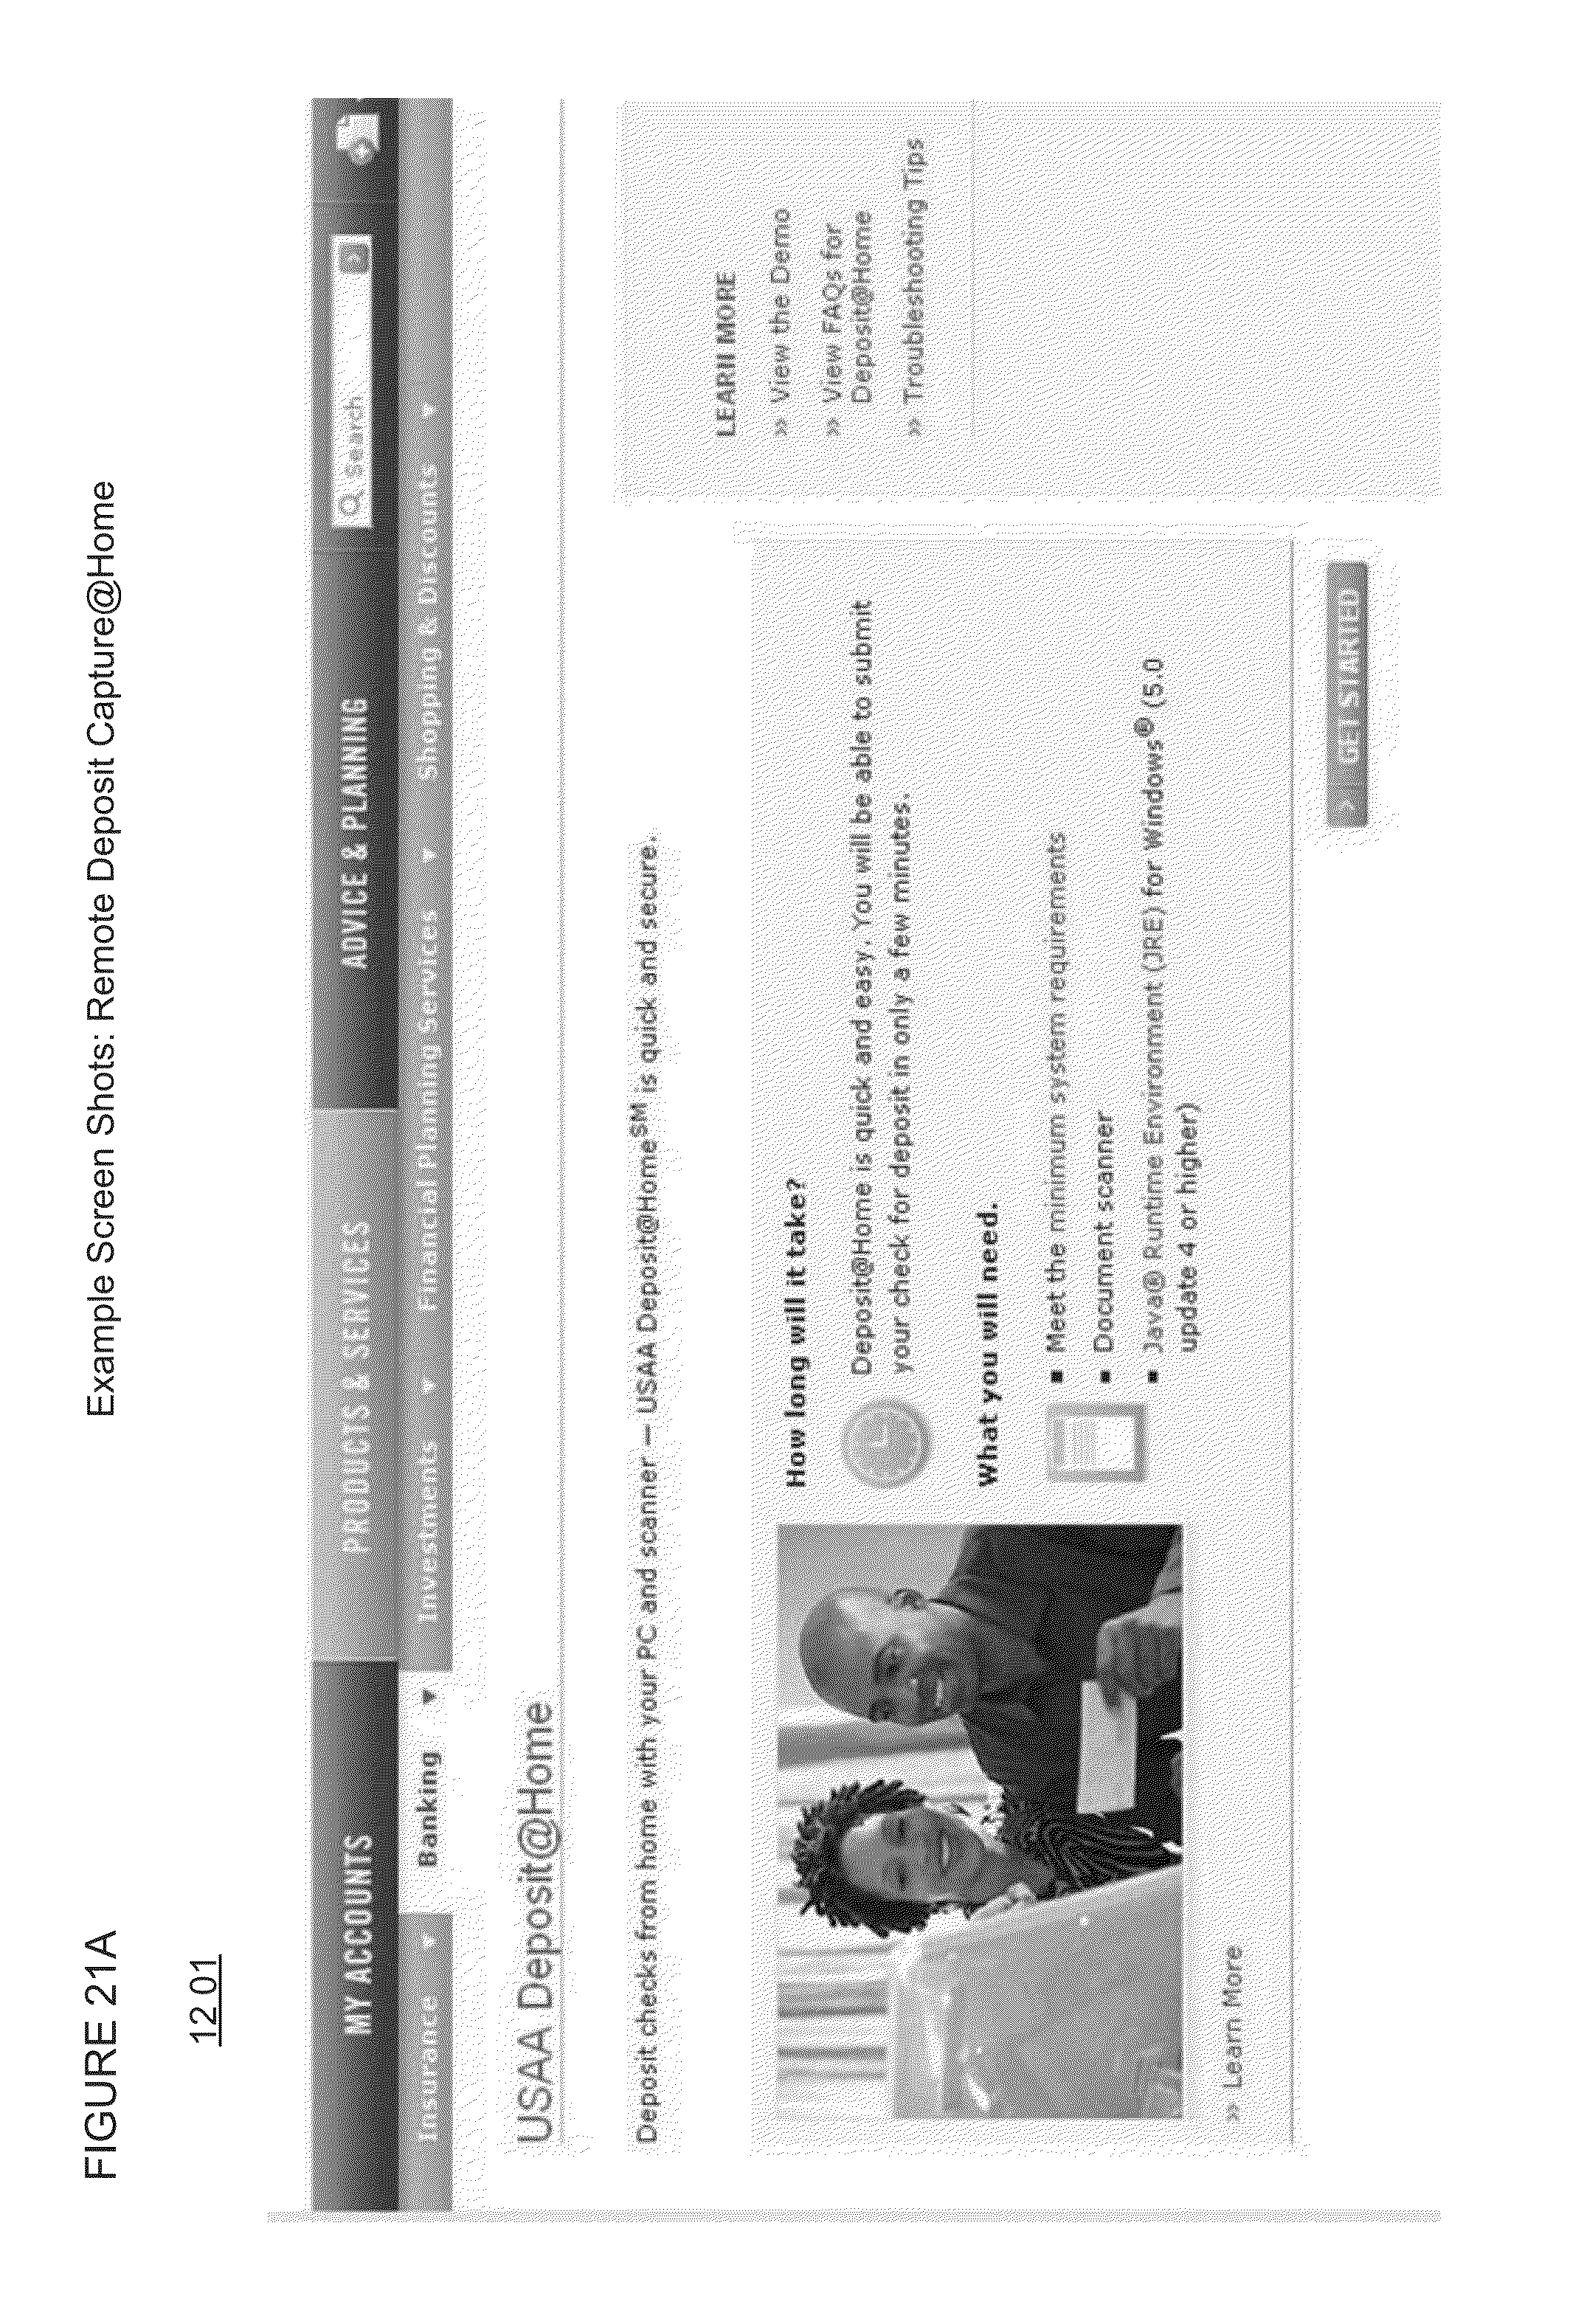 Patent US 8,688,579 B1